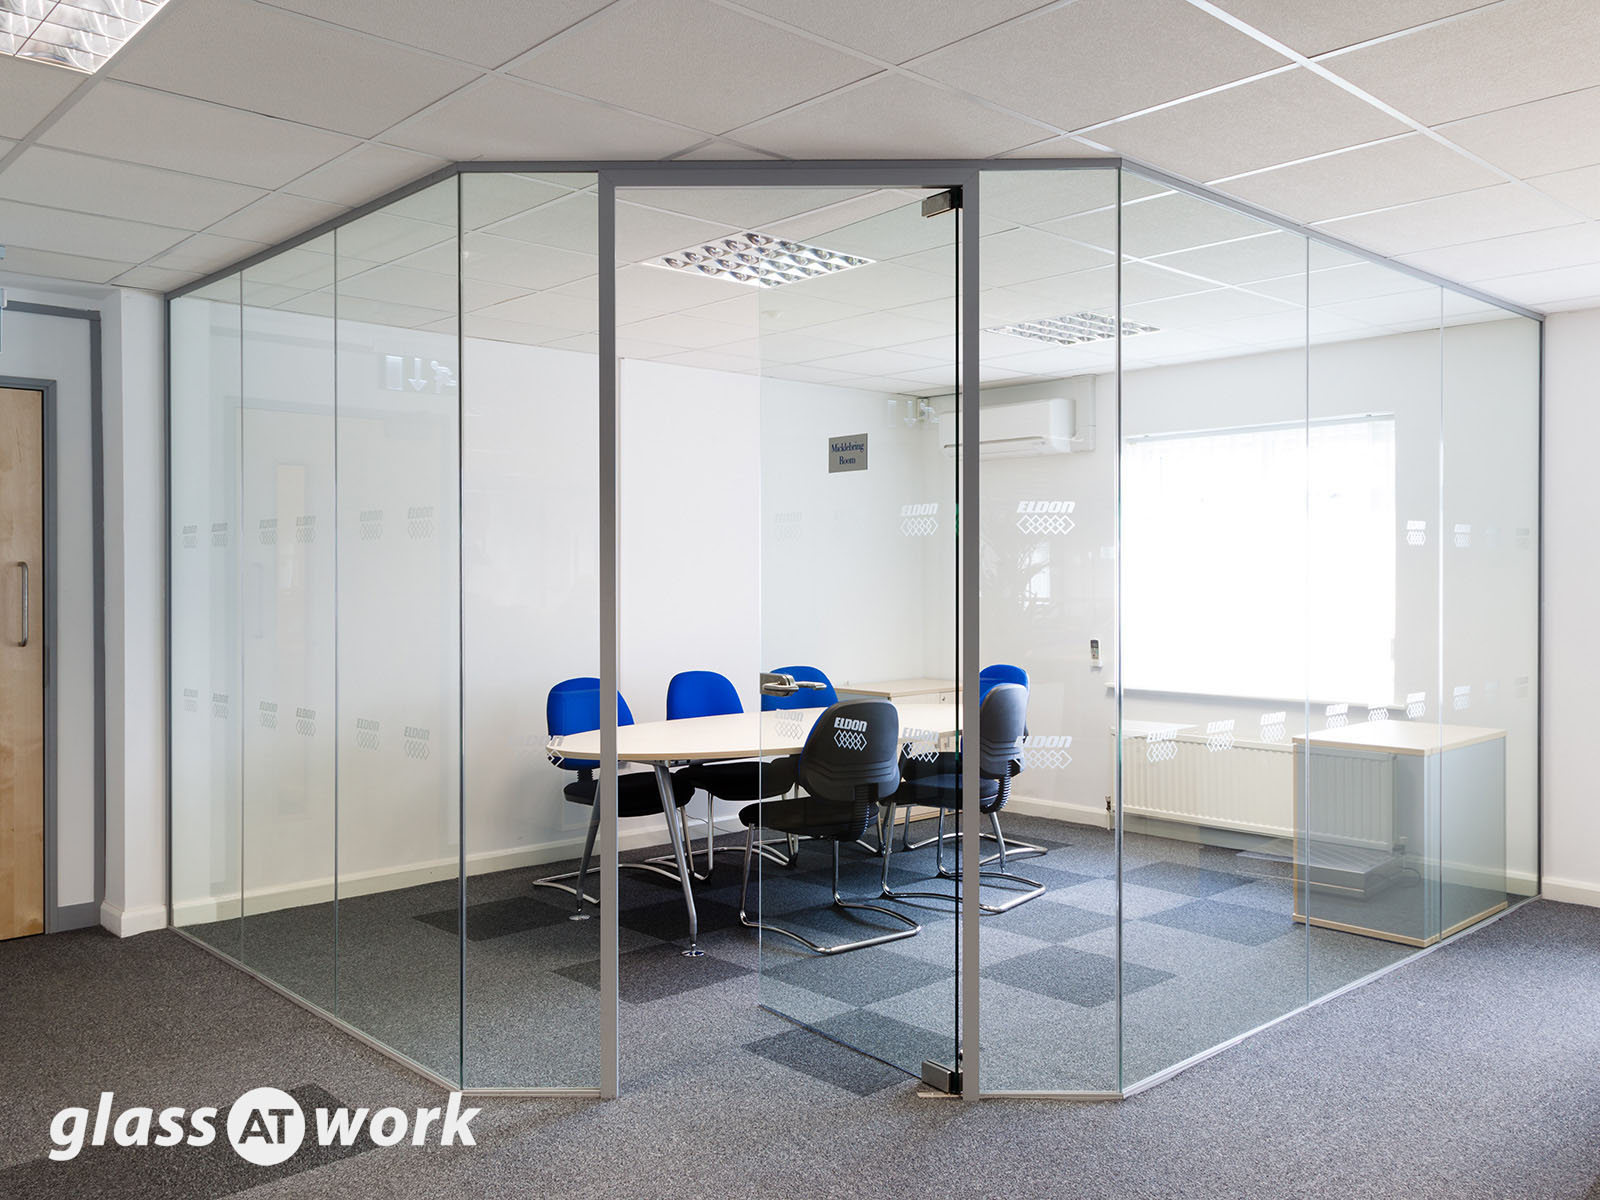 frameless single glazed glass office partitioning